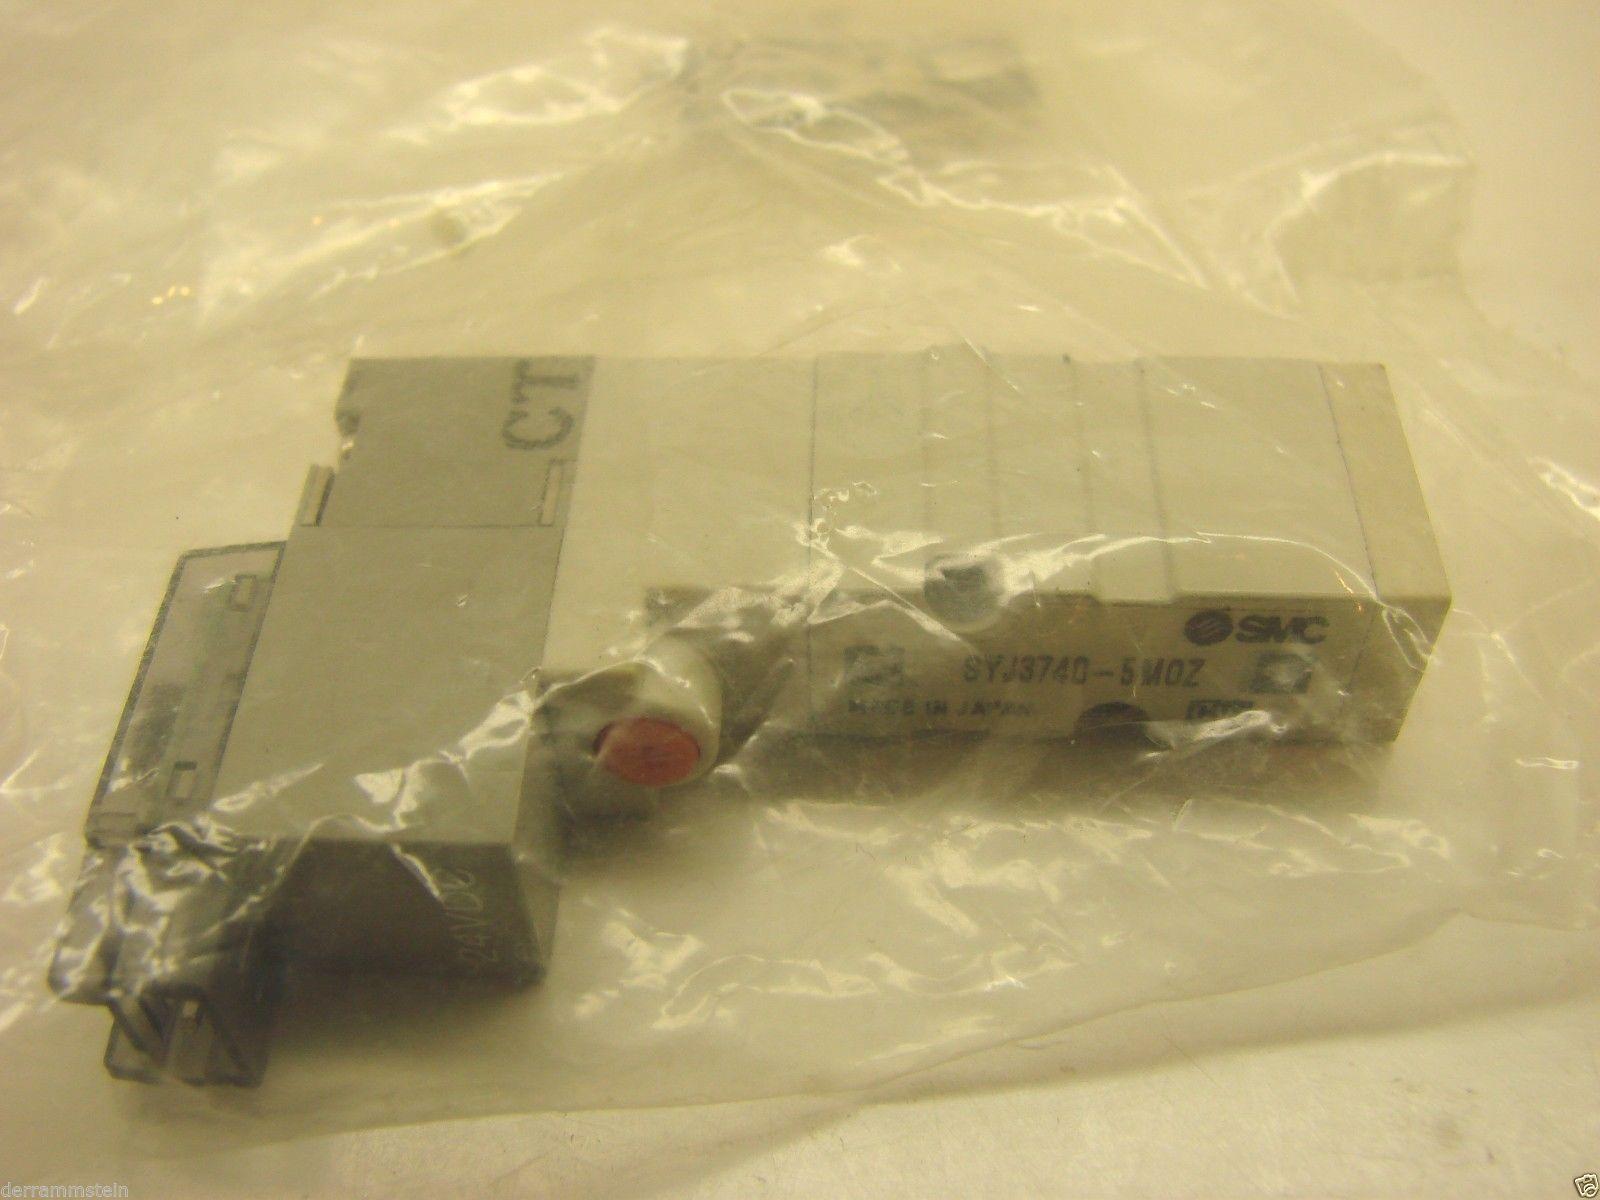 SMC SYJ3740-5MOZ Valve 4/5 Port Solenoid 24vdc NEW  b57